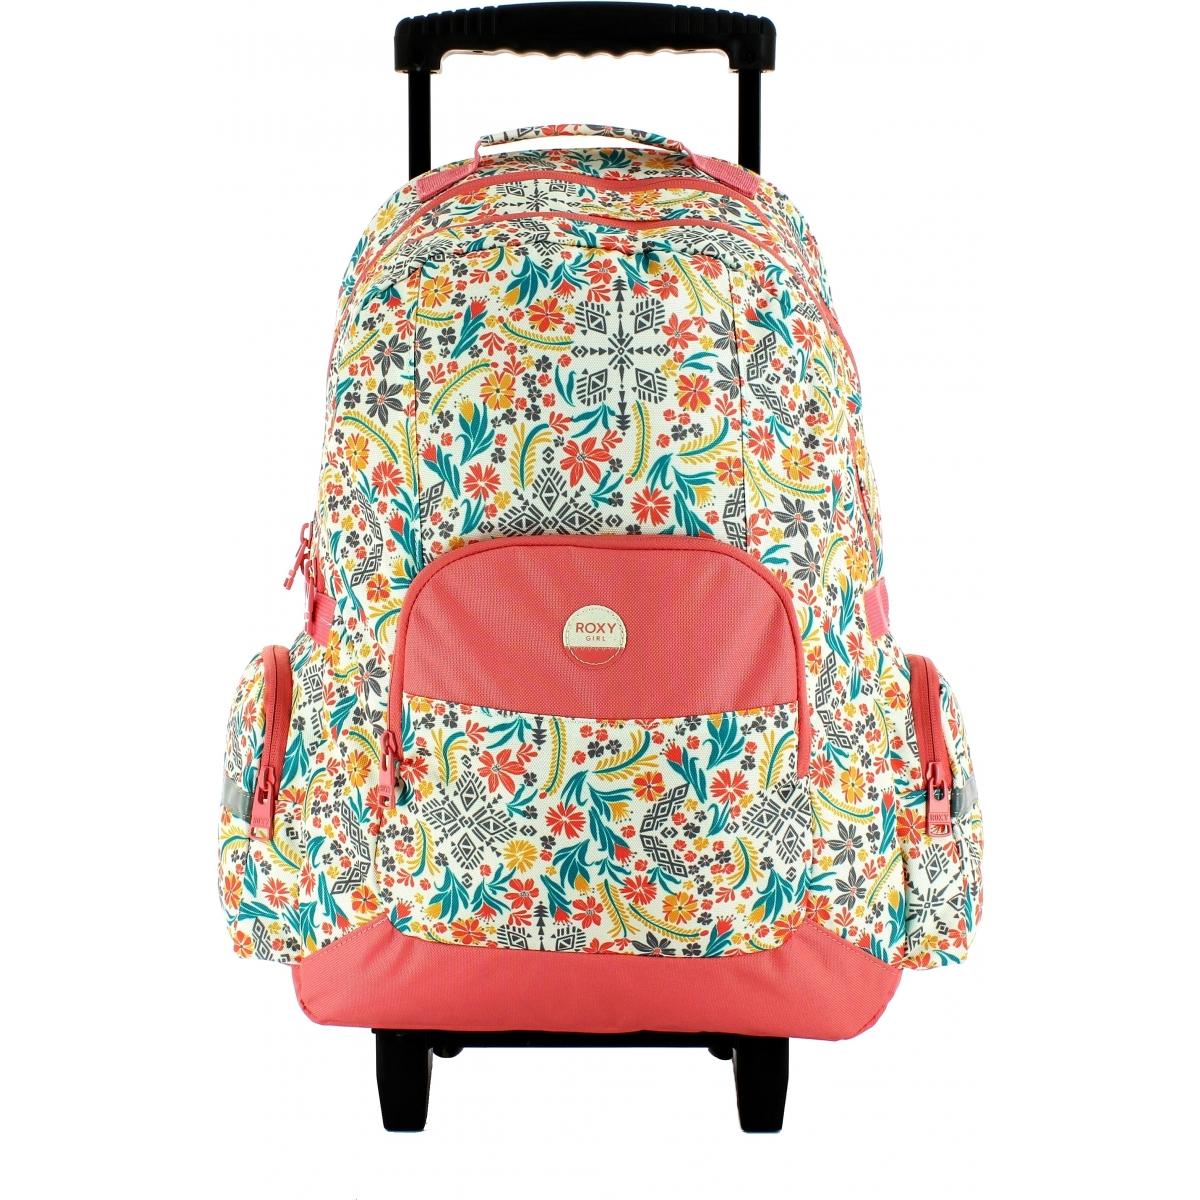 sac dos scolaire roulettes roxy p03024xyyb couleur principale assortis promotion. Black Bedroom Furniture Sets. Home Design Ideas